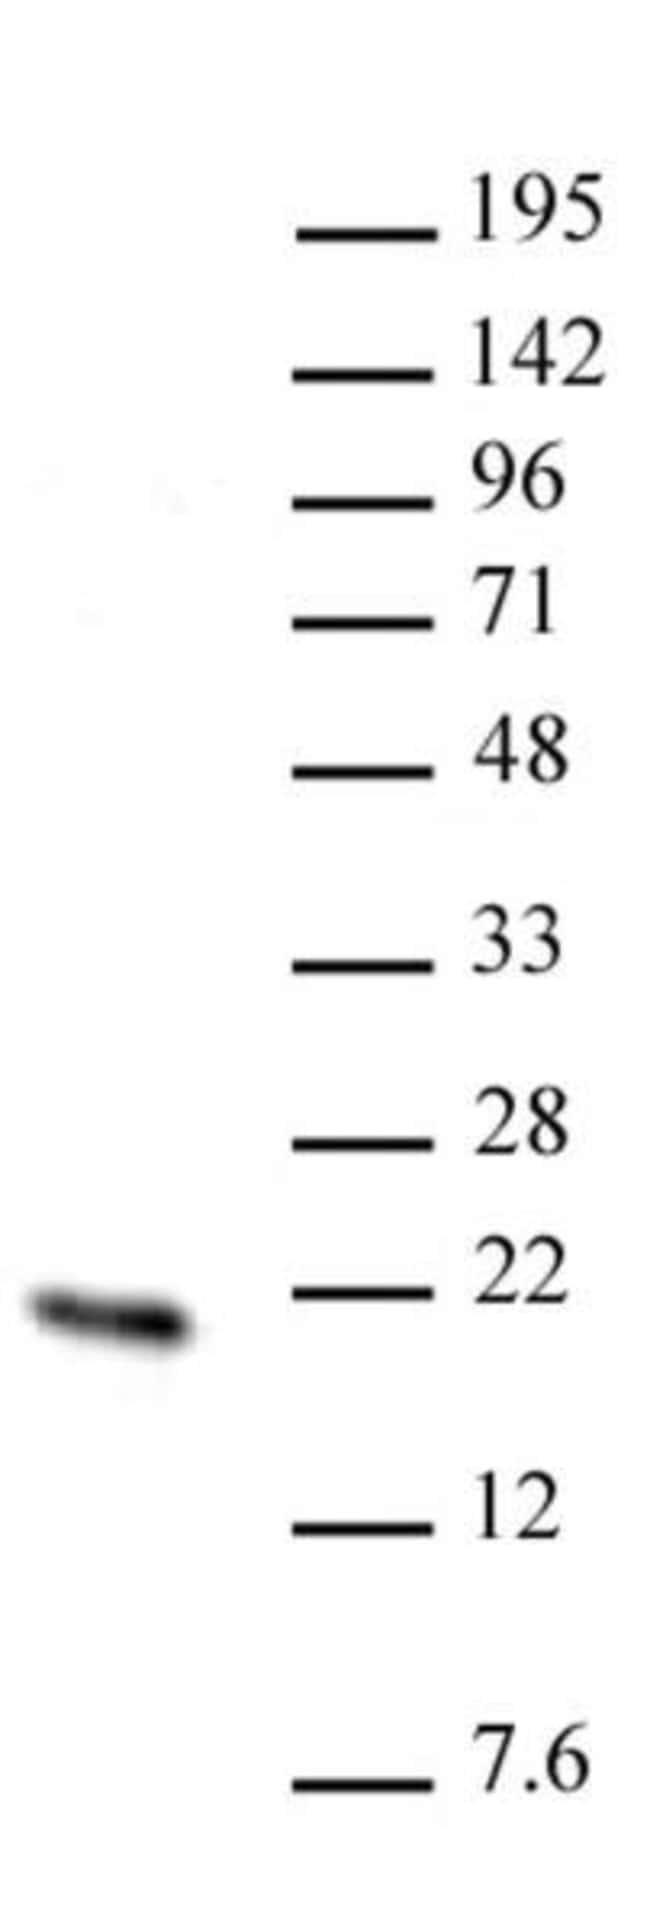 Hmgn2 Rabbit anti-Human, Unconjugated, Polyclonal, Active Motif:Antibodies:Primary